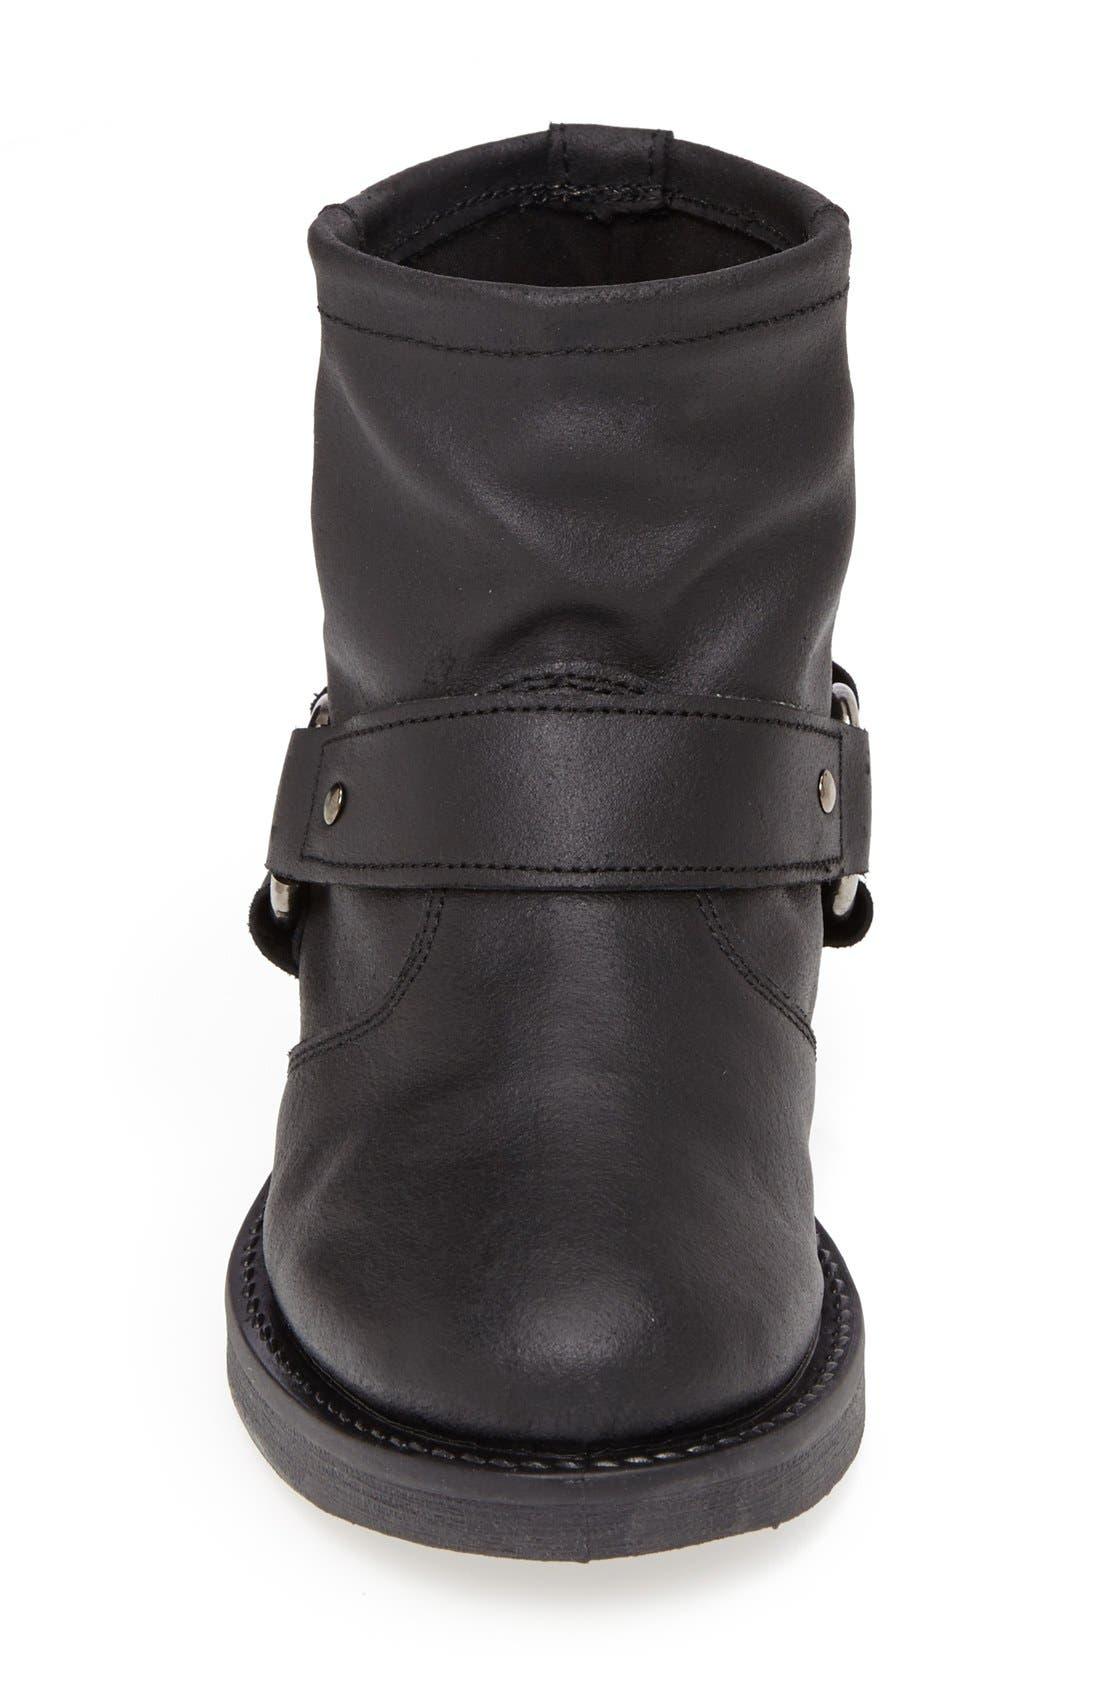 Alternate Image 3  - Topshop 'Buster' Leather Harness Biker Boot (Women)